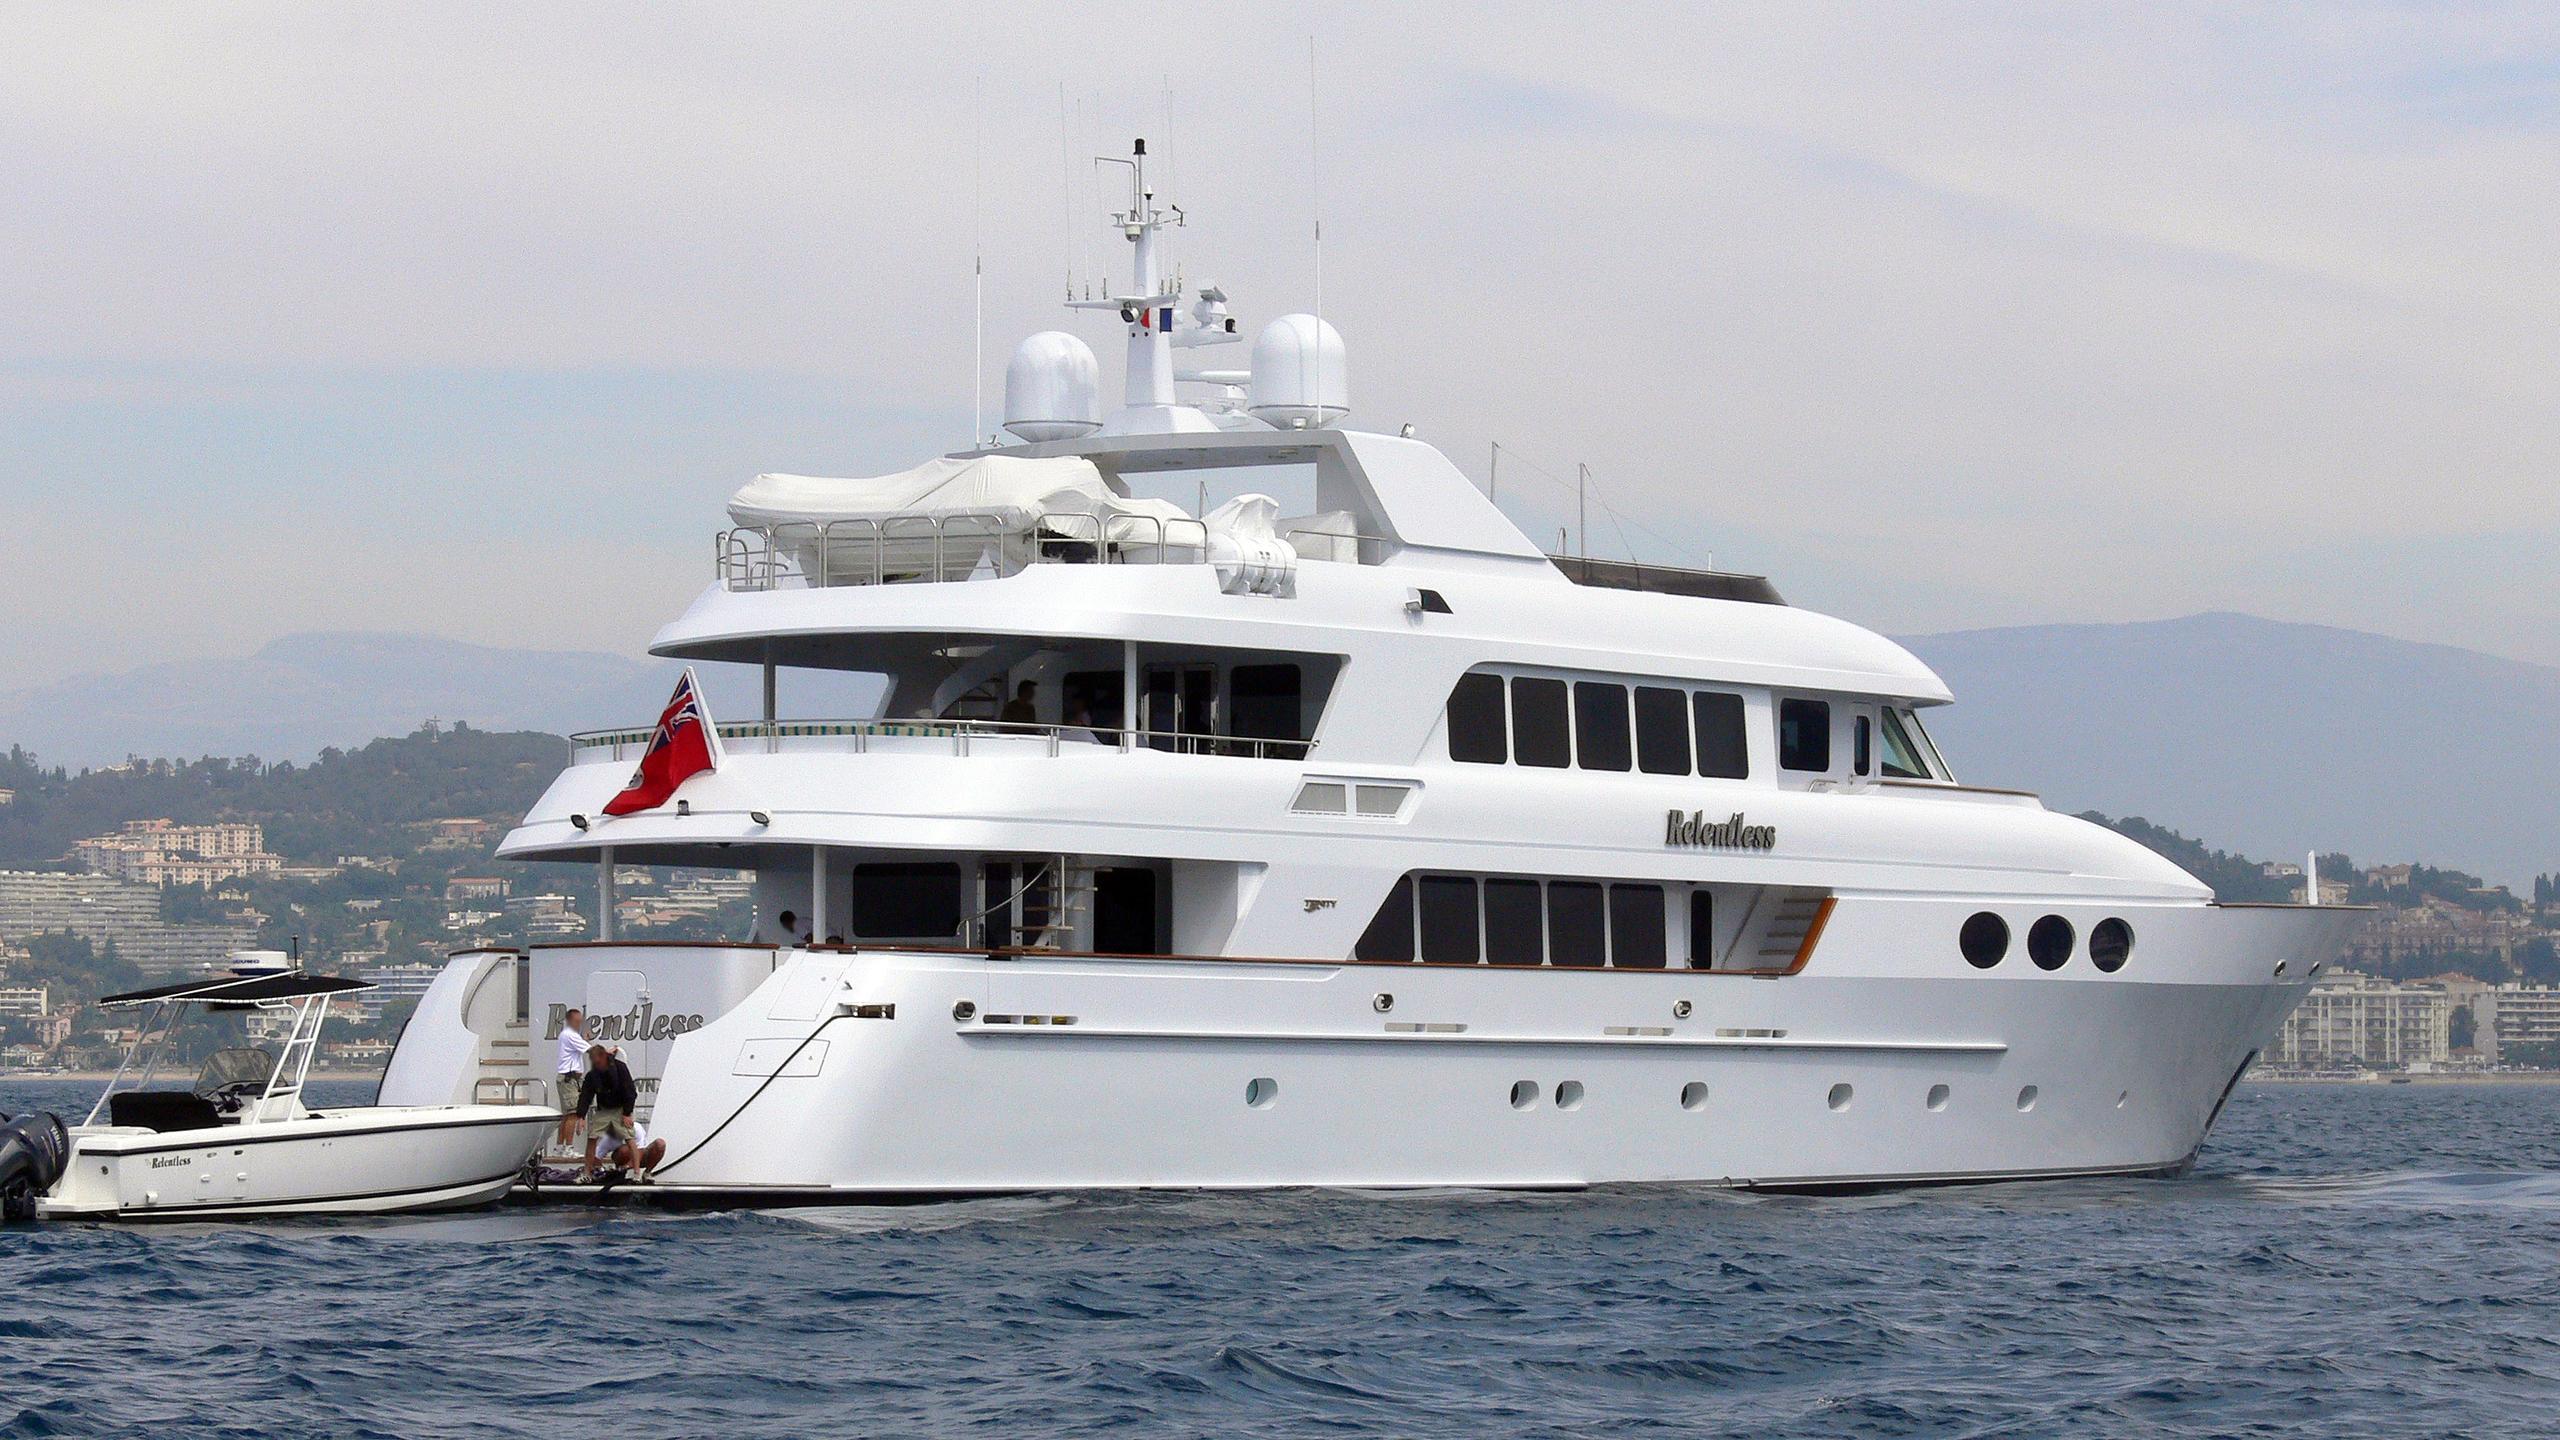 relentless-motor-yacht-trinity-142-2001-43m-stern